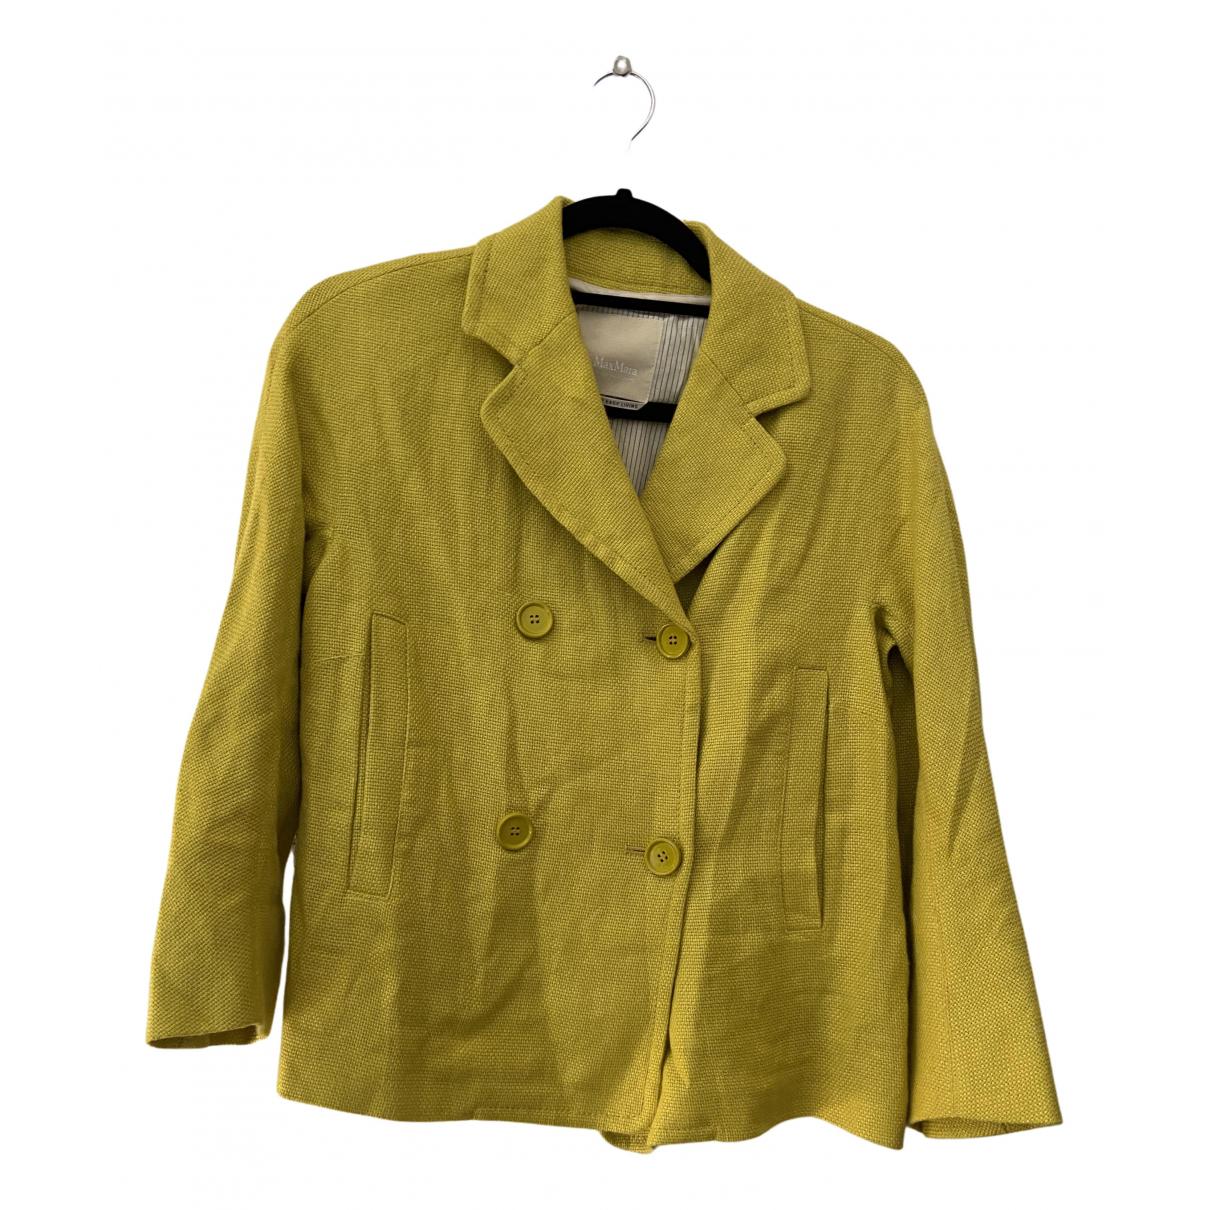 Max Mara s - Veste Max Mara Atelier pour femme en lin - jaune